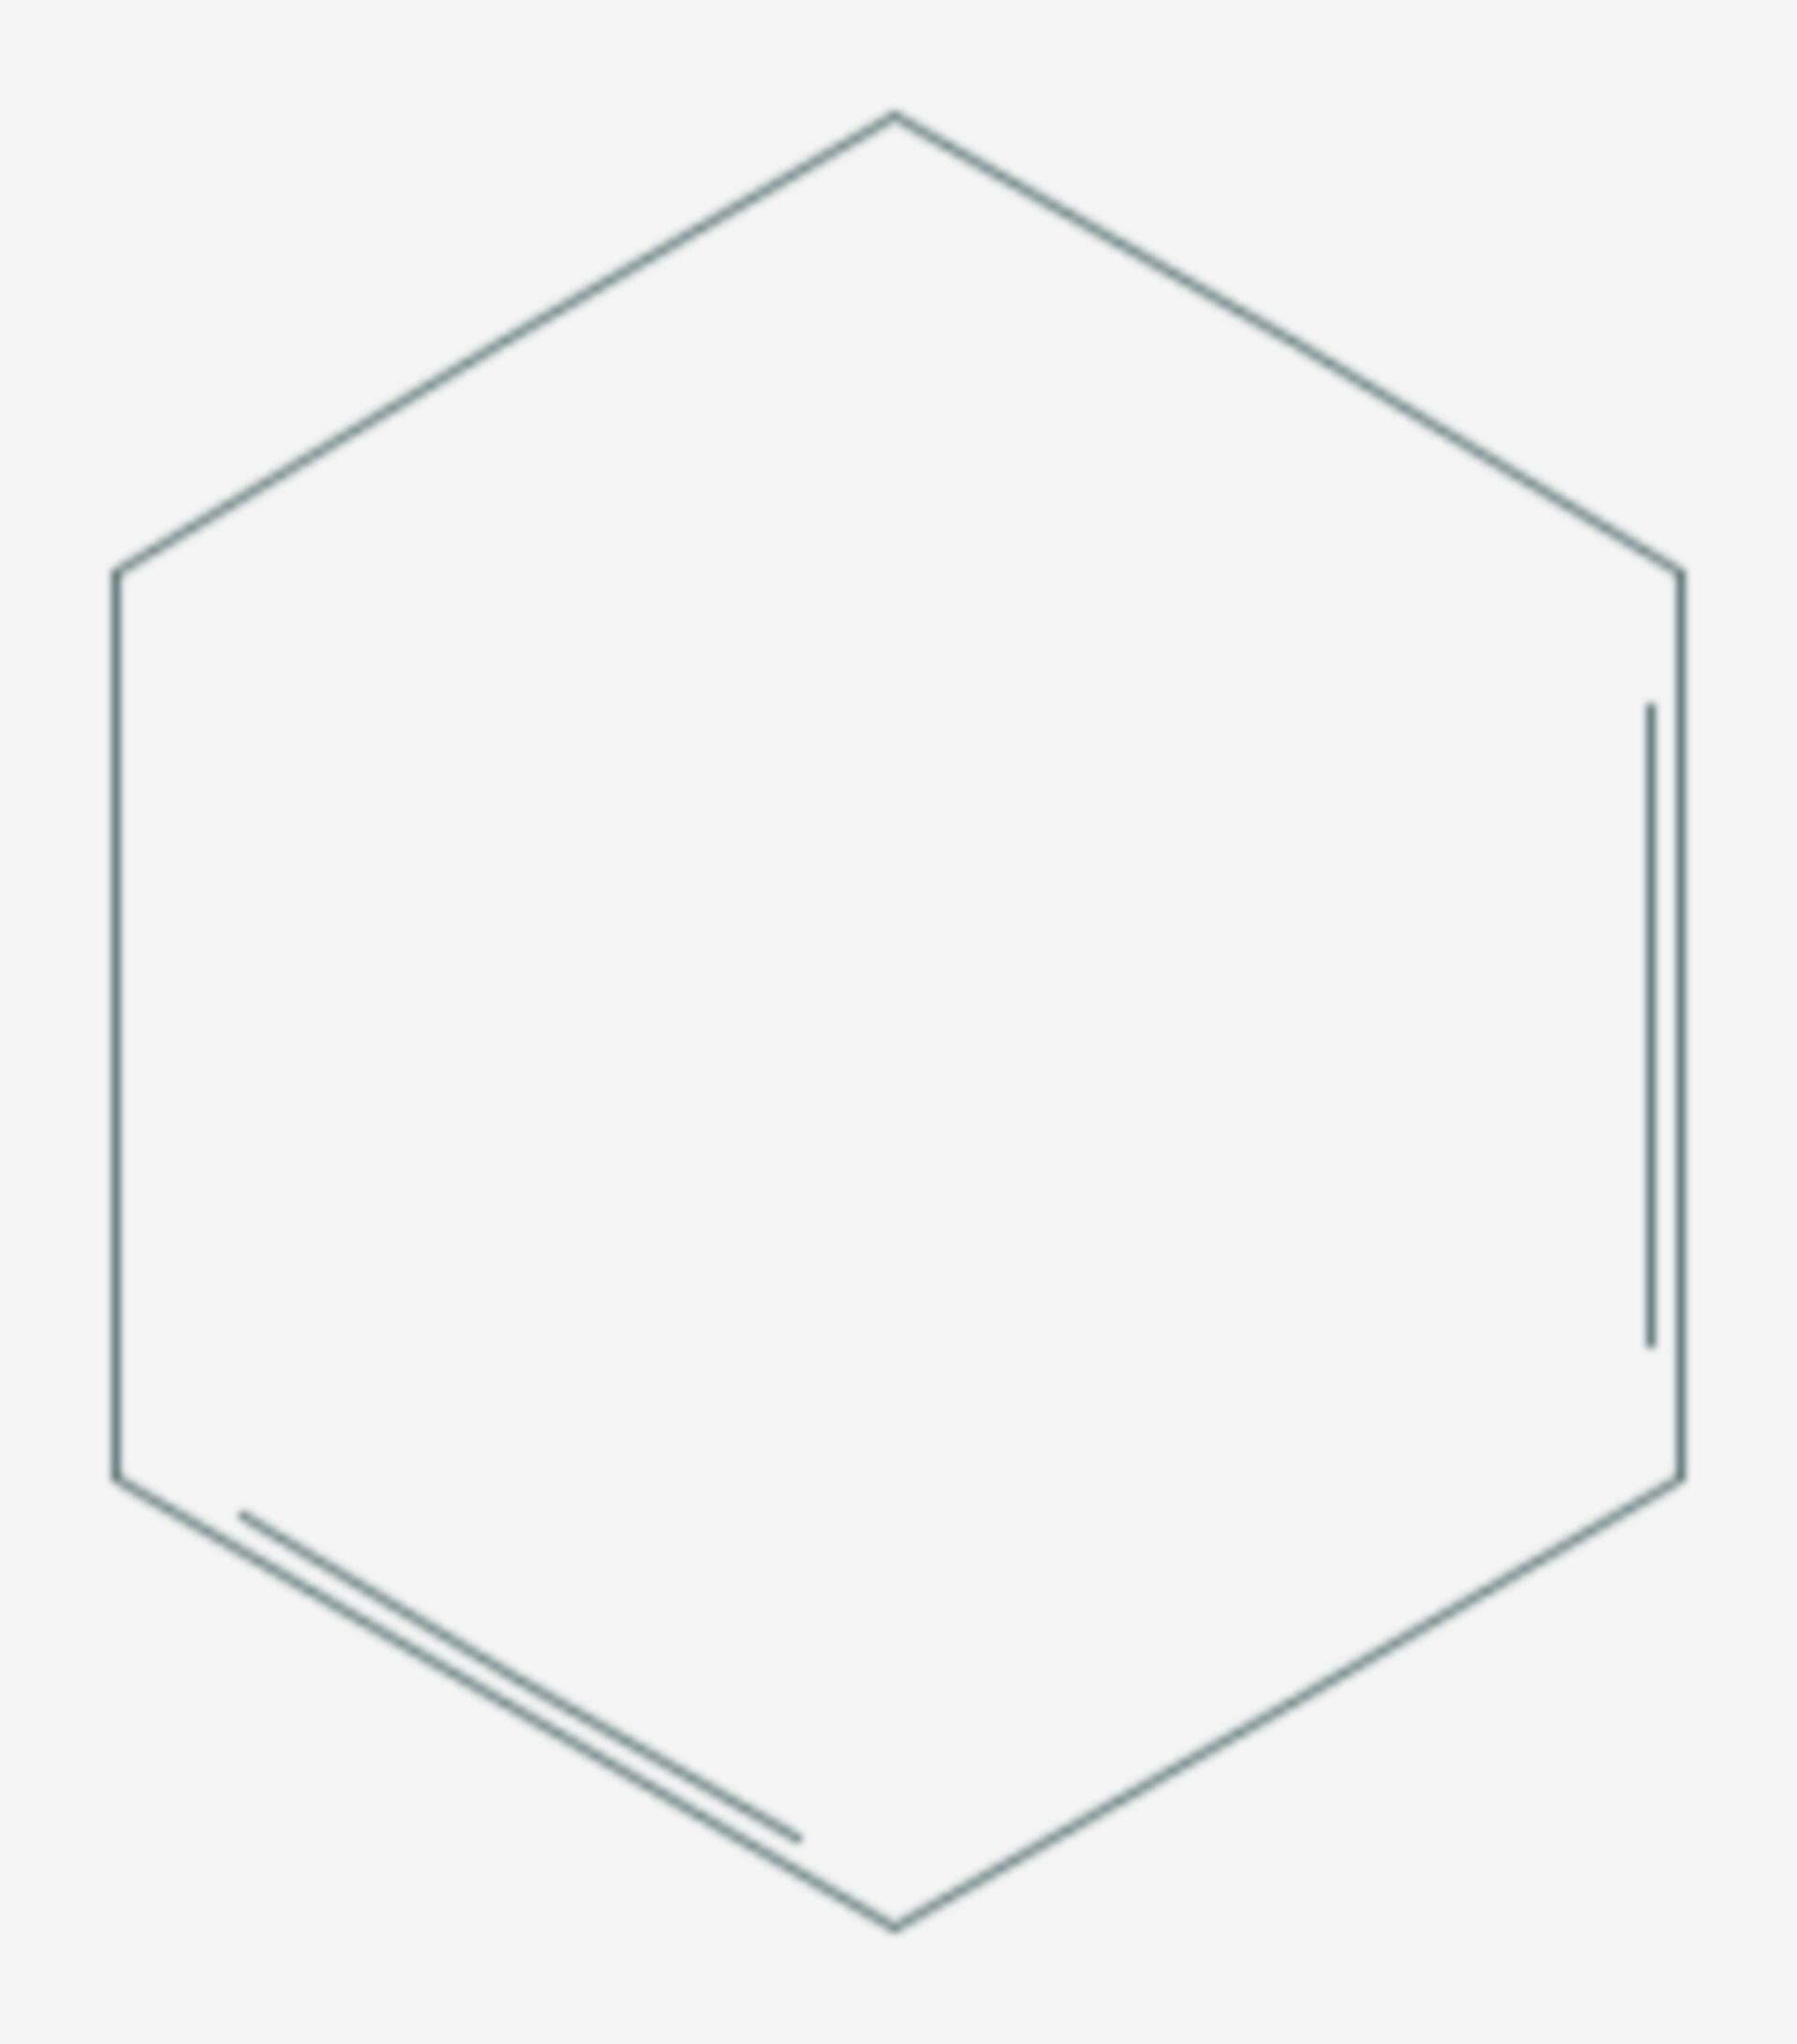 1,3-Cyclohexadien (Strukturformel)